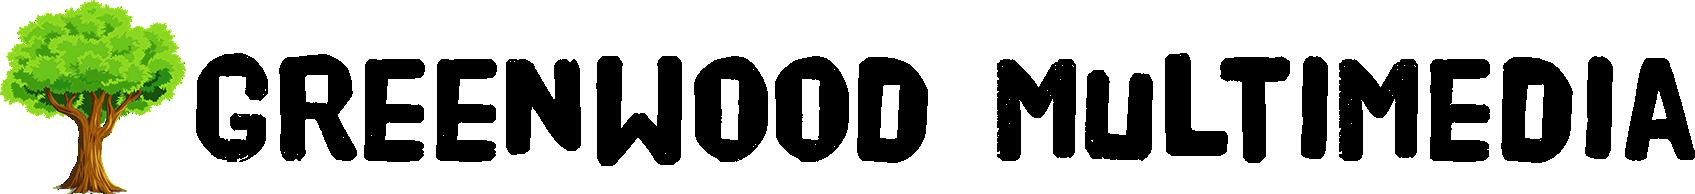 GreenWood Multimedia